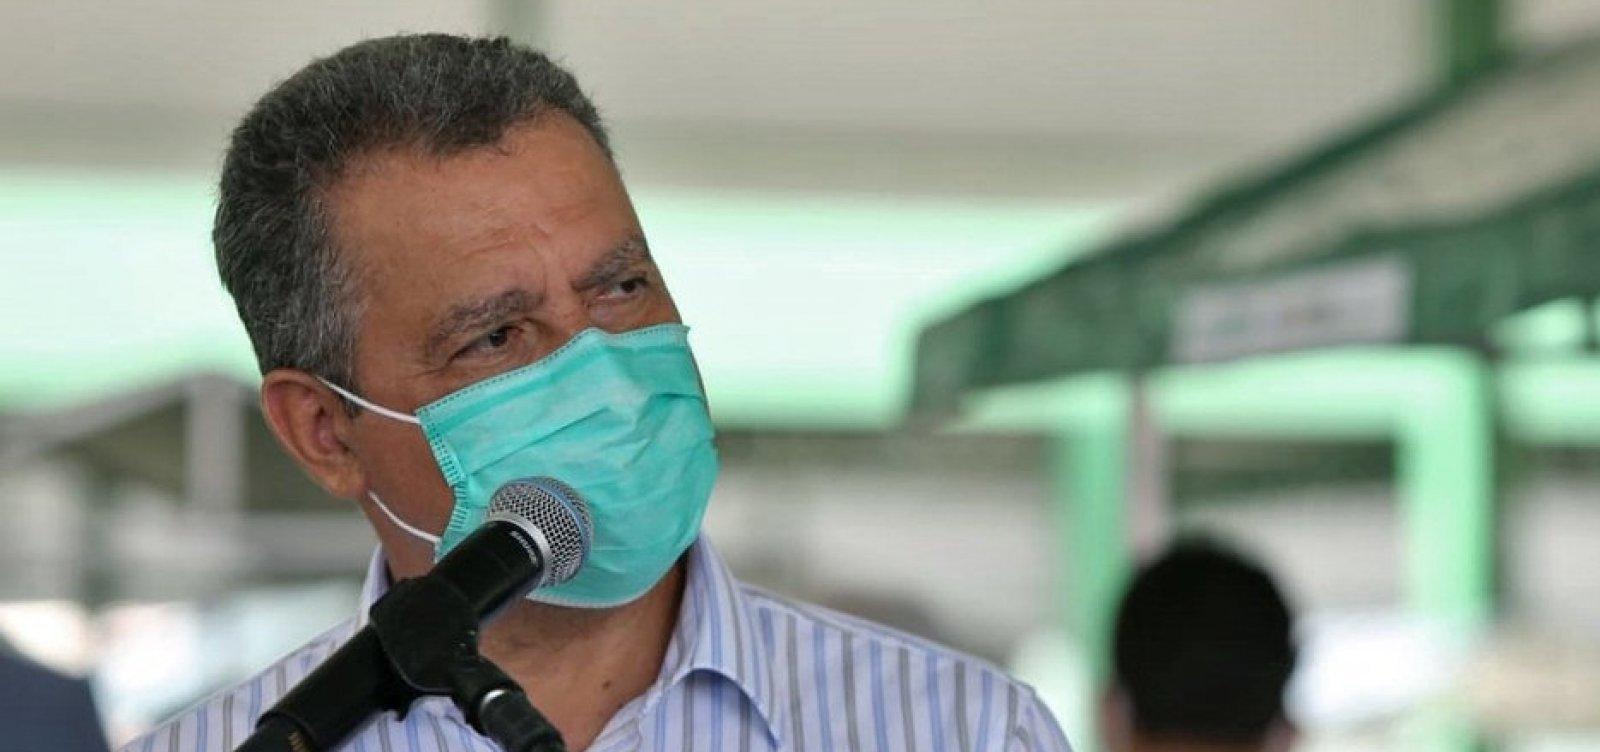 Bahia corre risco de ter colapso no sistema de saúde, afirma Rui Costa